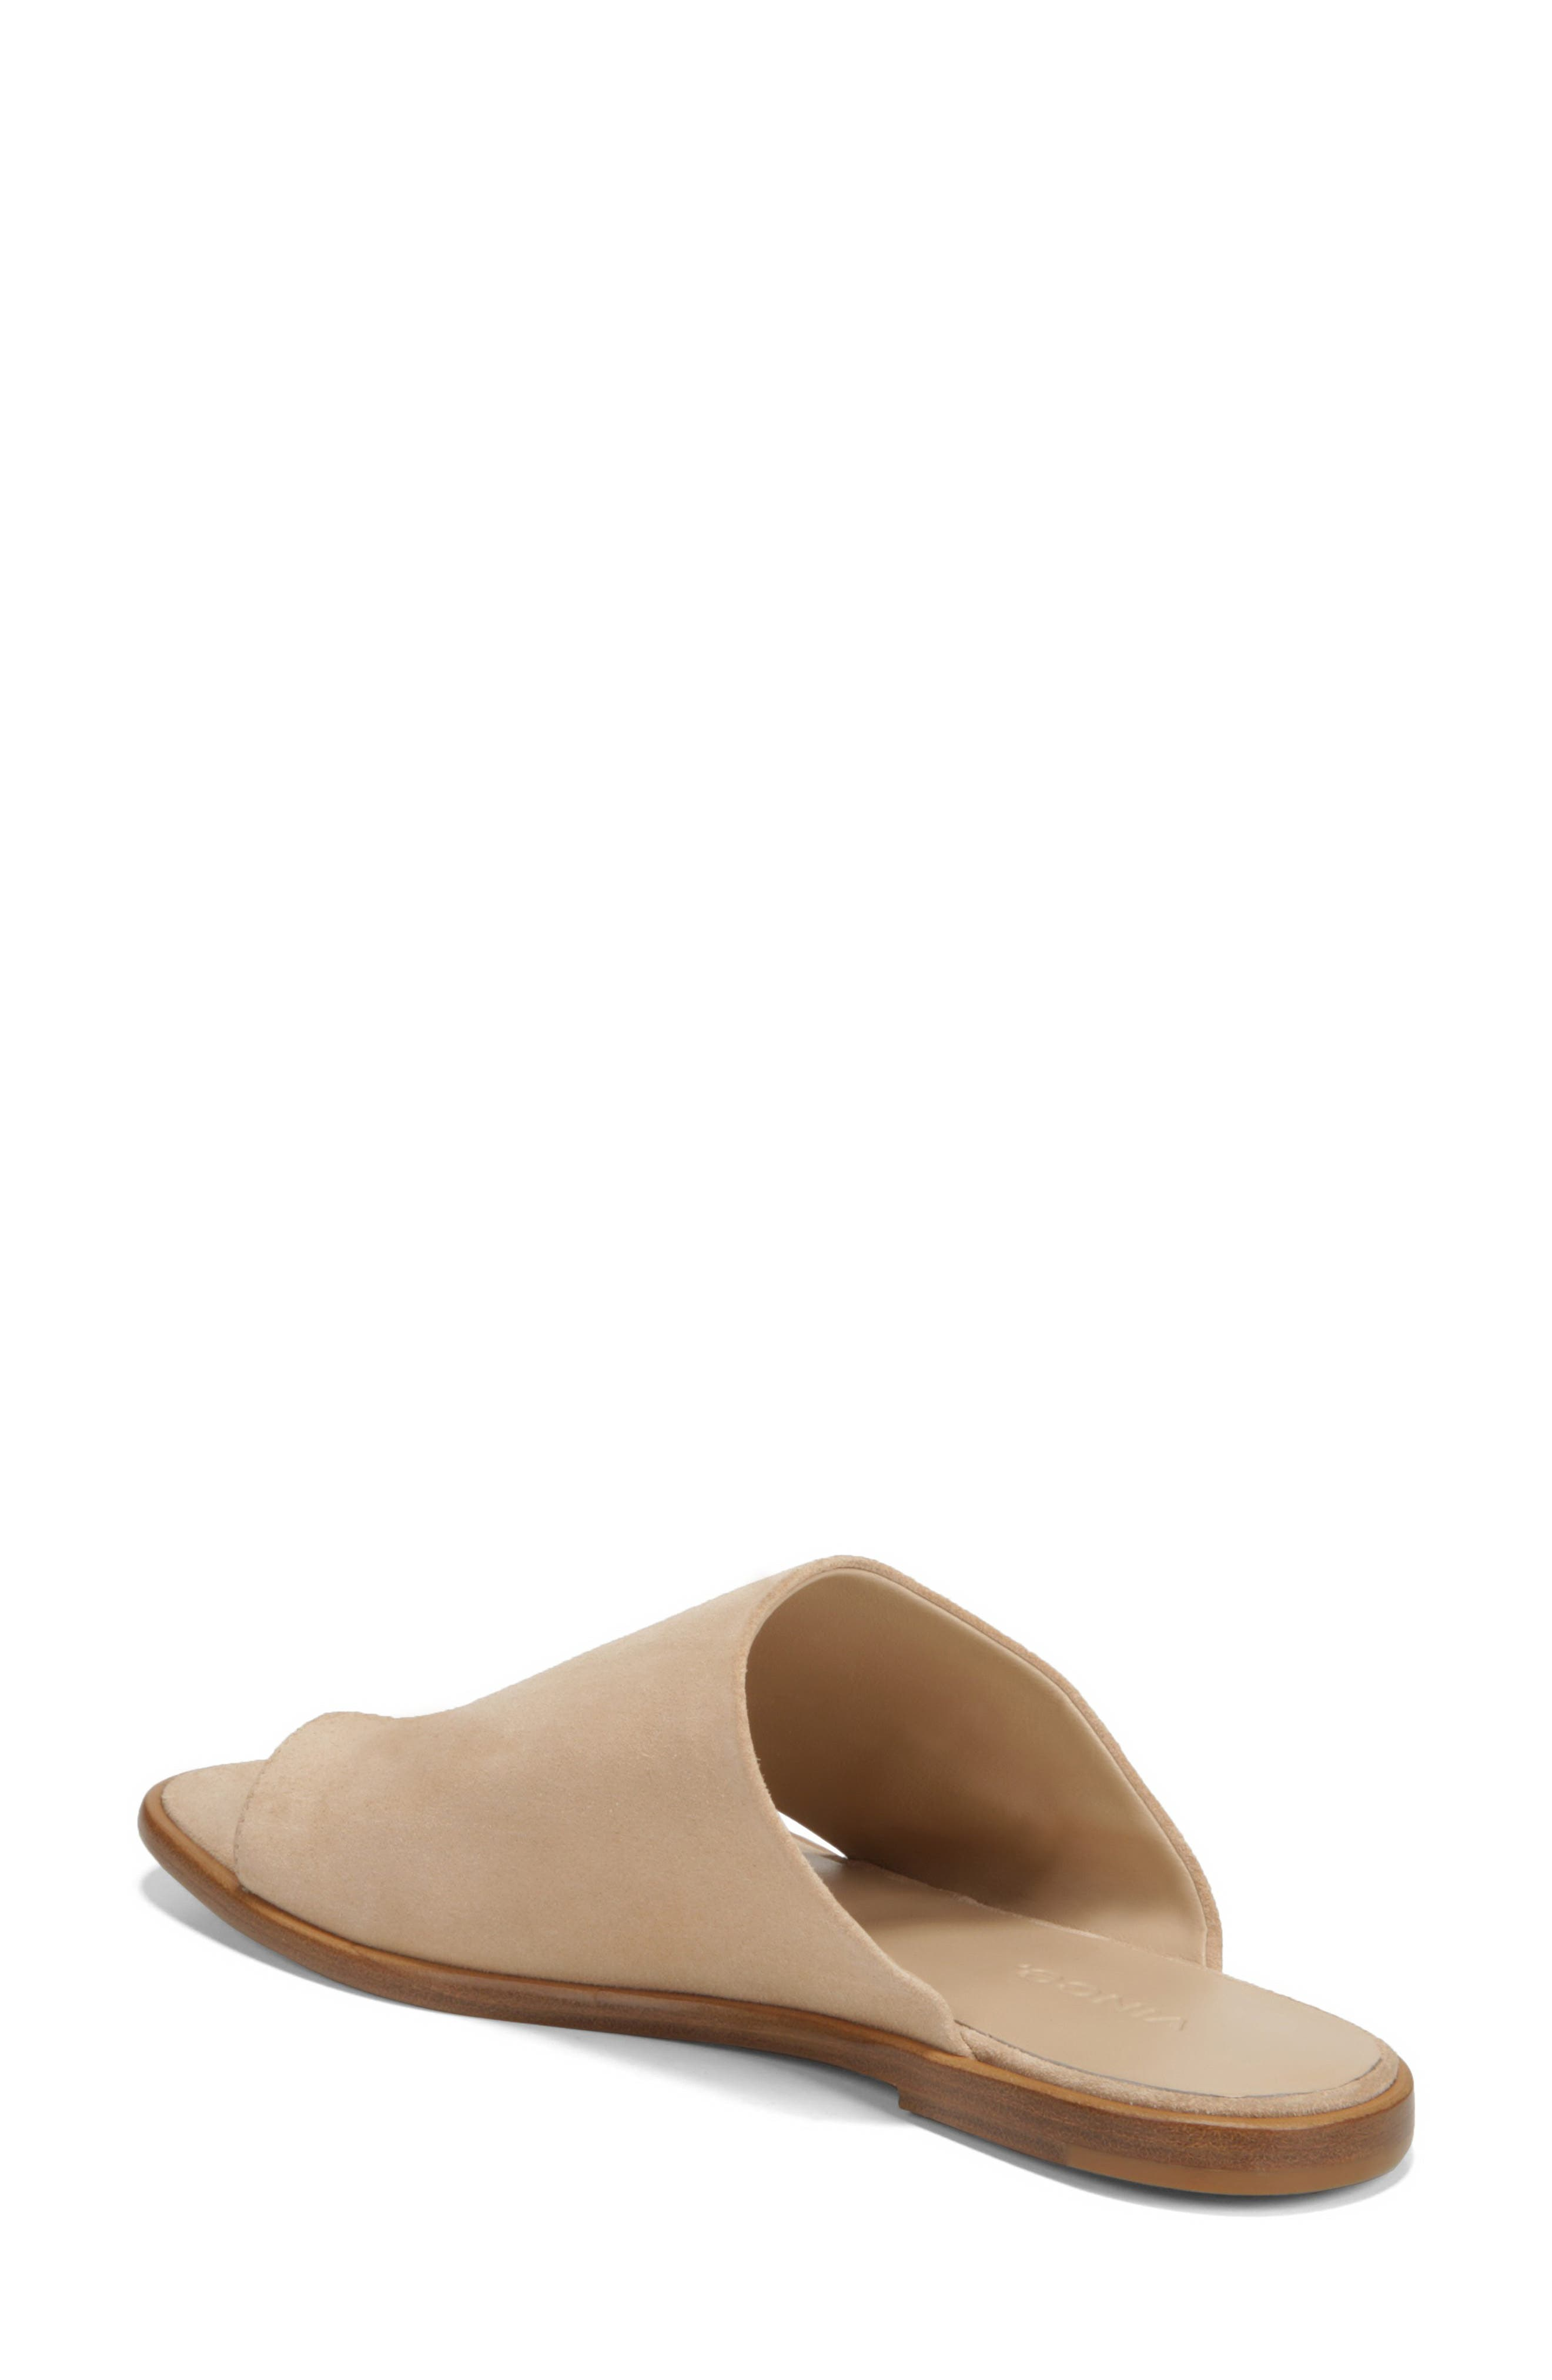 Edris Toe Loop Sandal,                             Alternate thumbnail 2, color,                             SAND